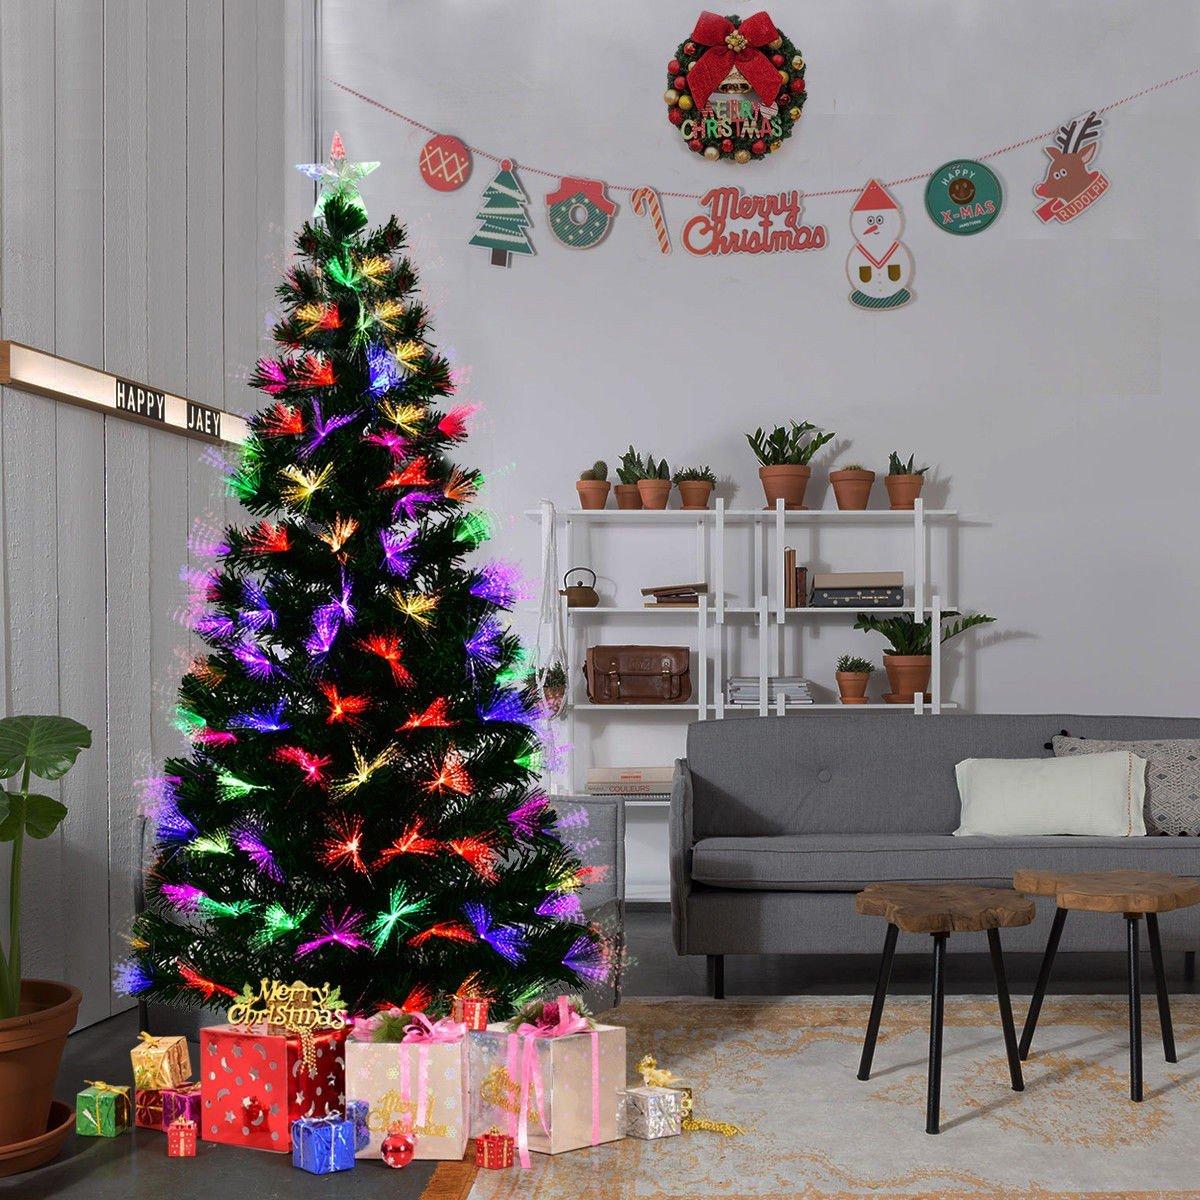 7 5 Fiber Optic Christmas Tree: 5′ / 6′ / 7′ Fiber Optic Artificial Christmas Tree W